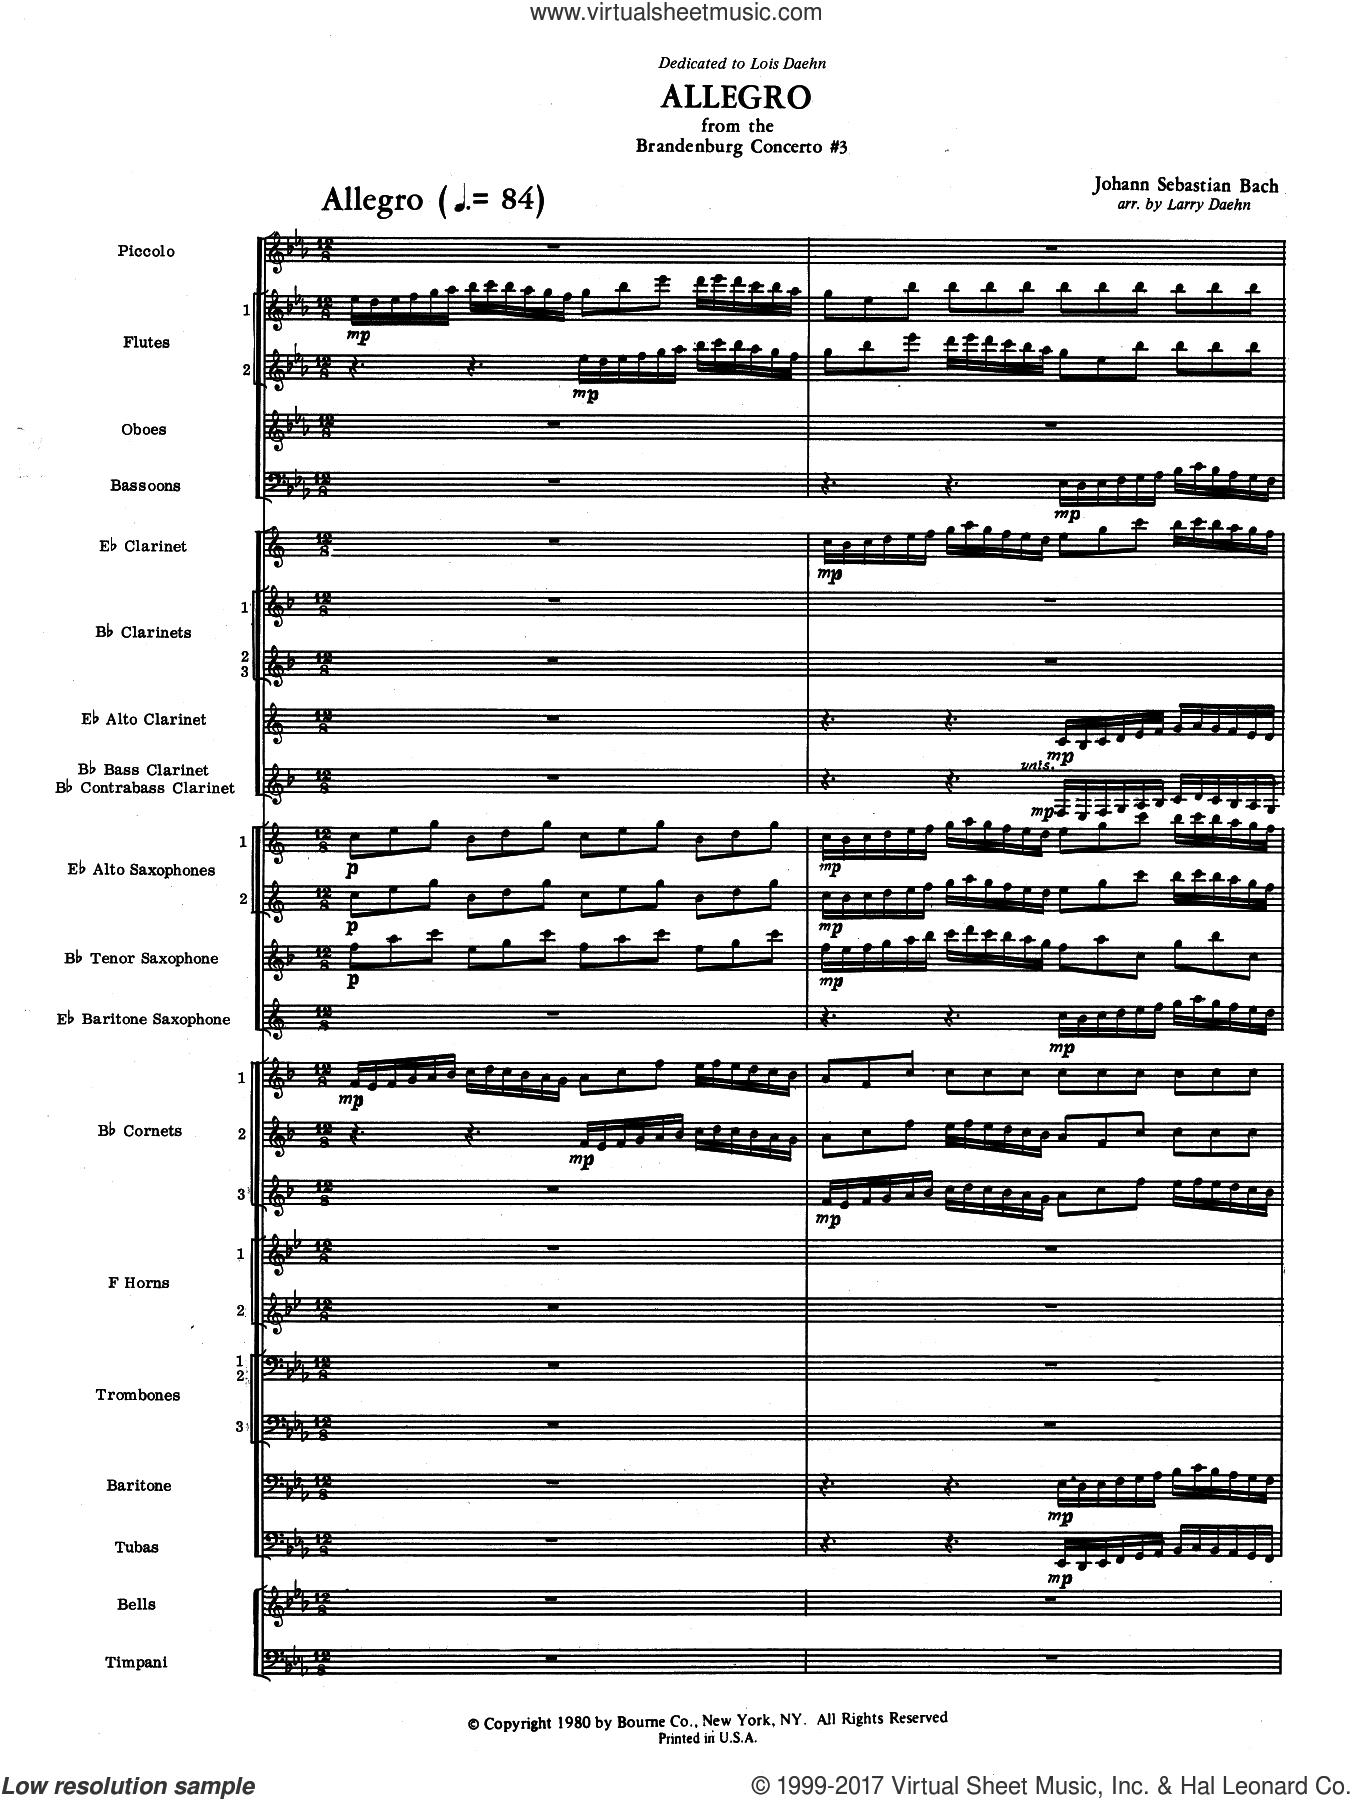 Allegro from Brandenburg Concerto No. 3 (COMPLETE) sheet music for concert band by Johann Sebastian Bach and Larry Daehn, intermediate skill level